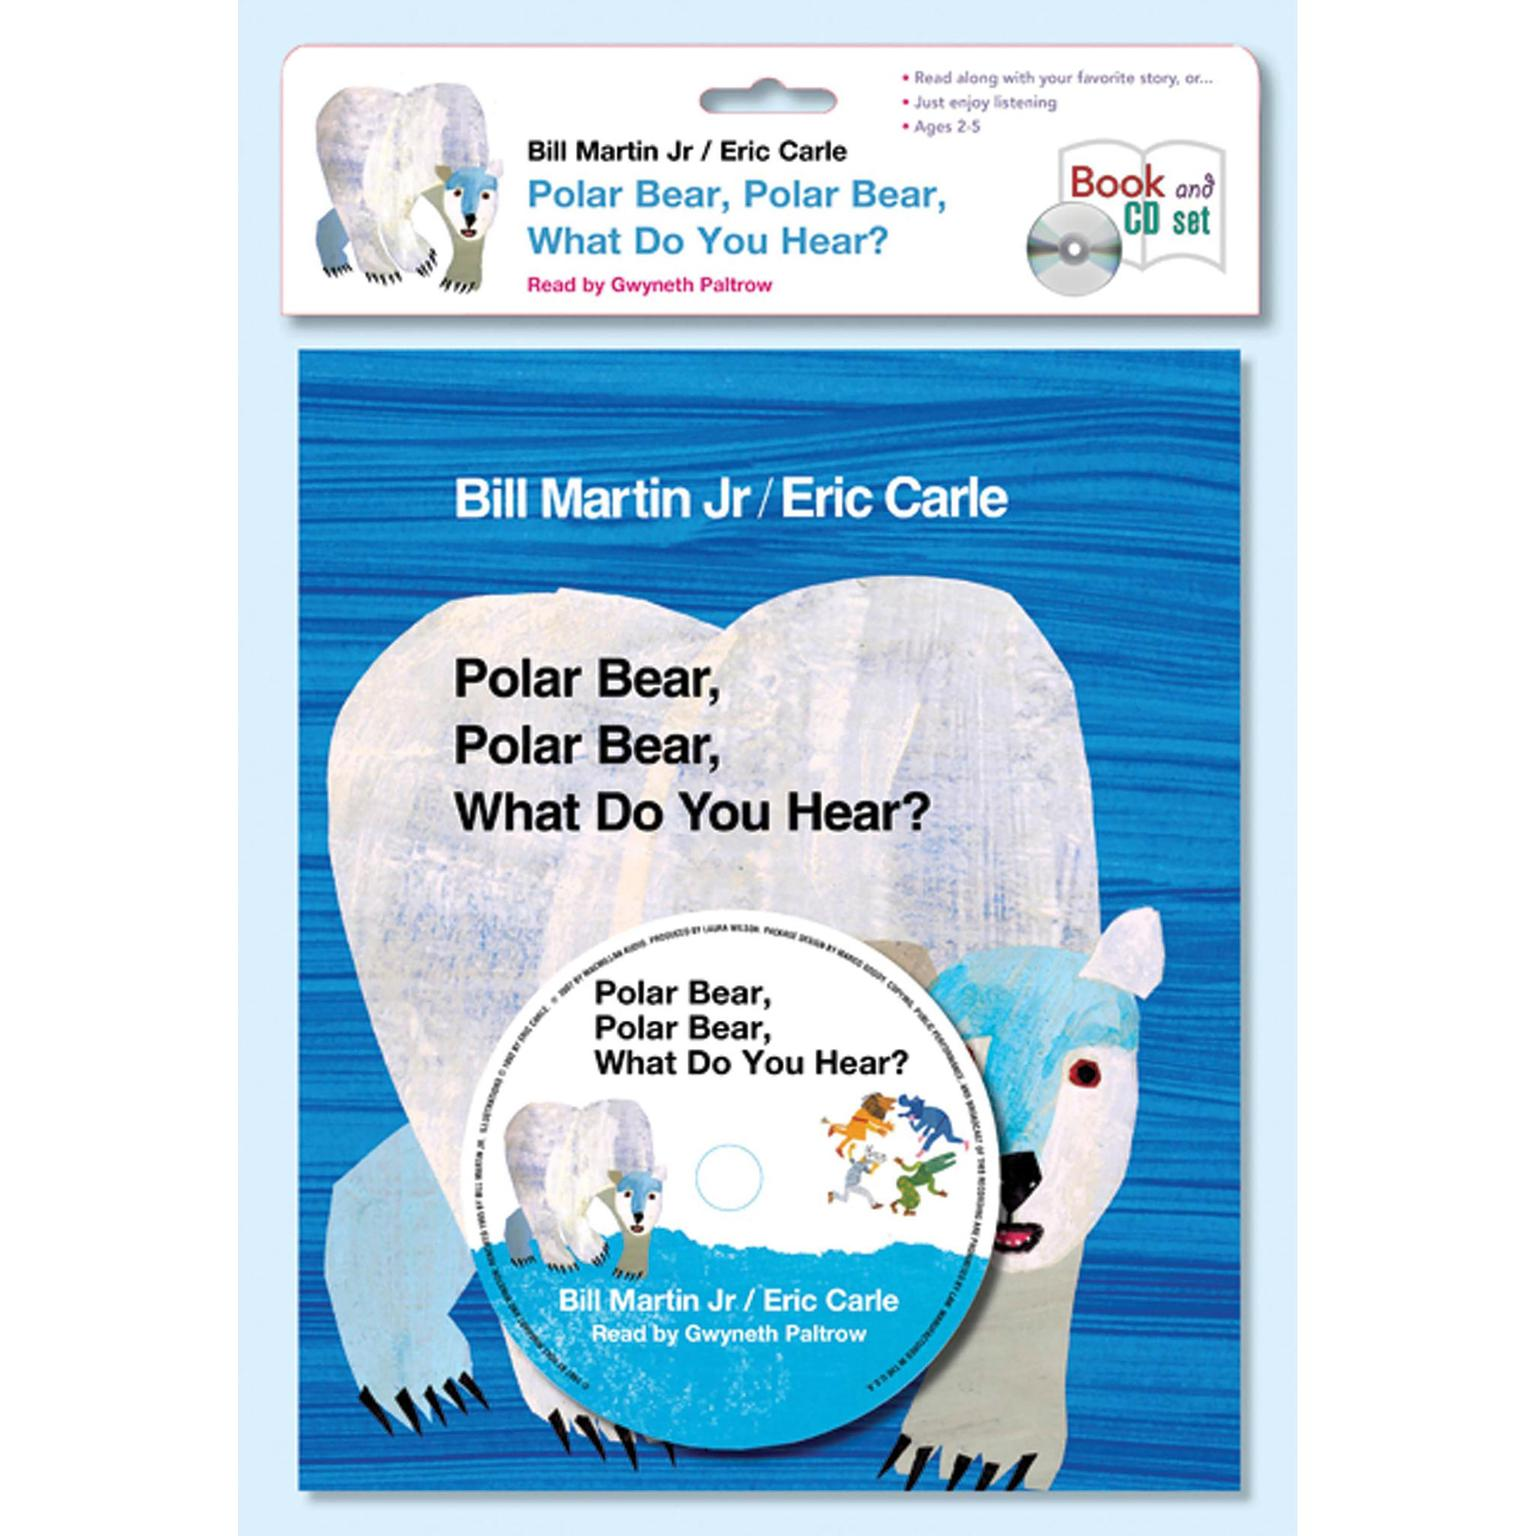 Polar Bear Polar Bear What Do You Hear